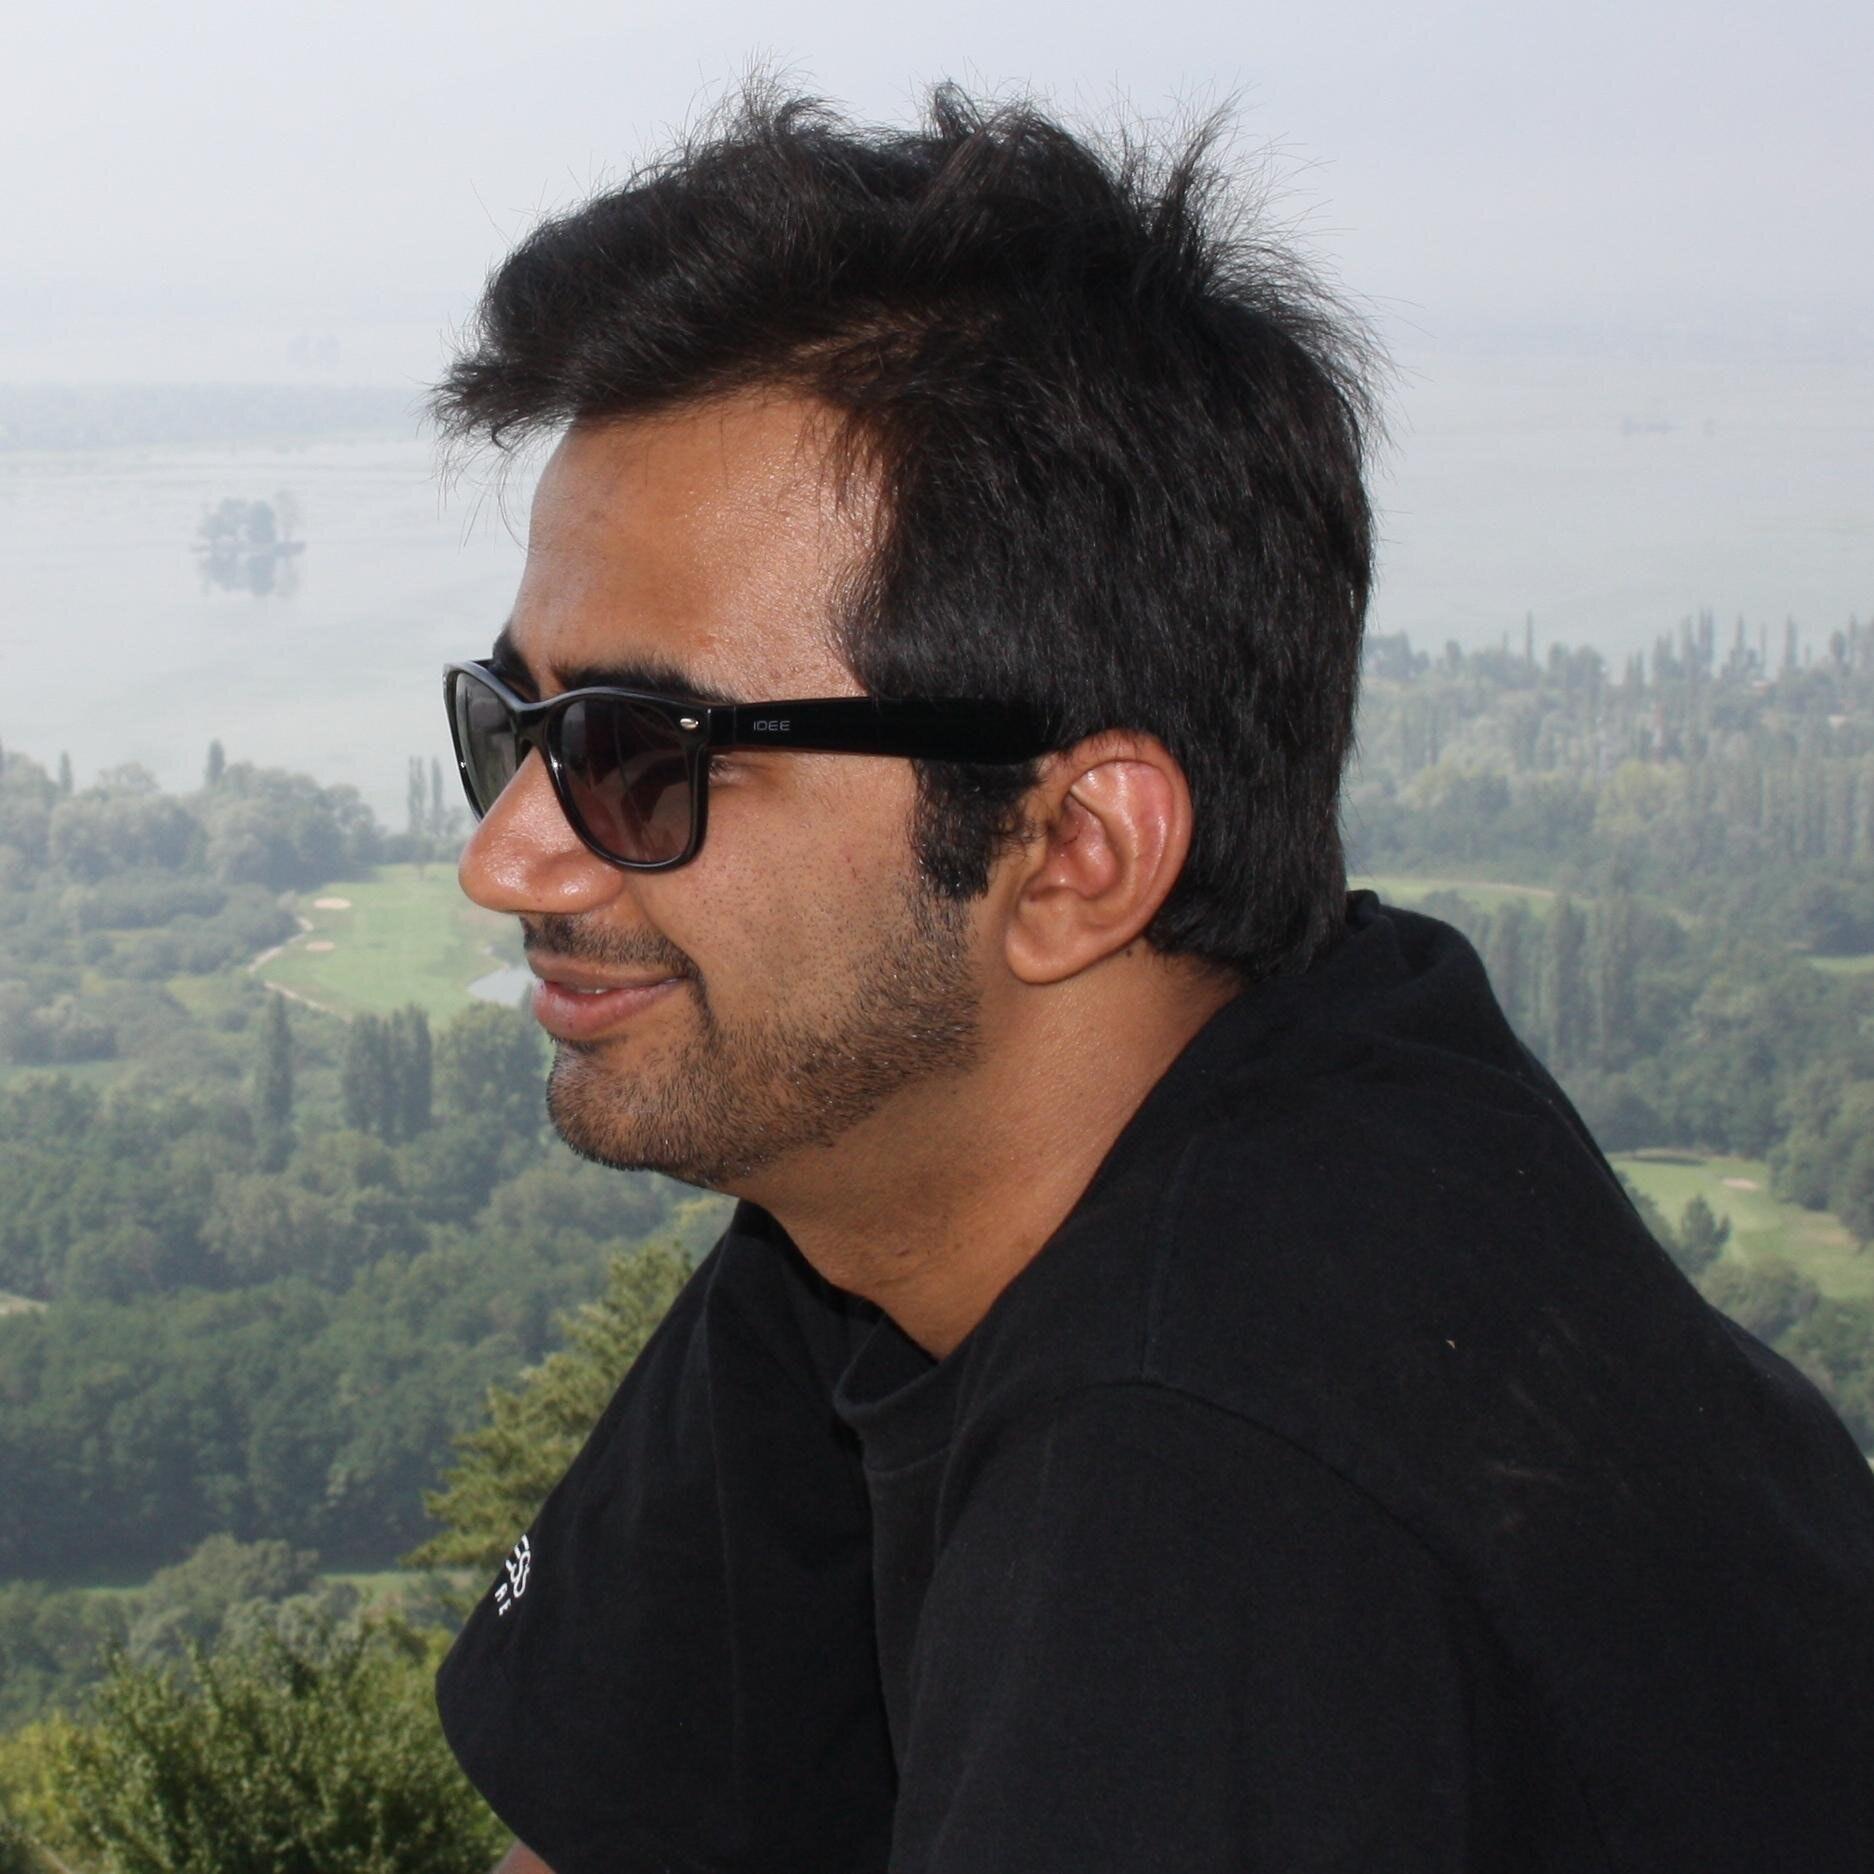 Suchit Puri